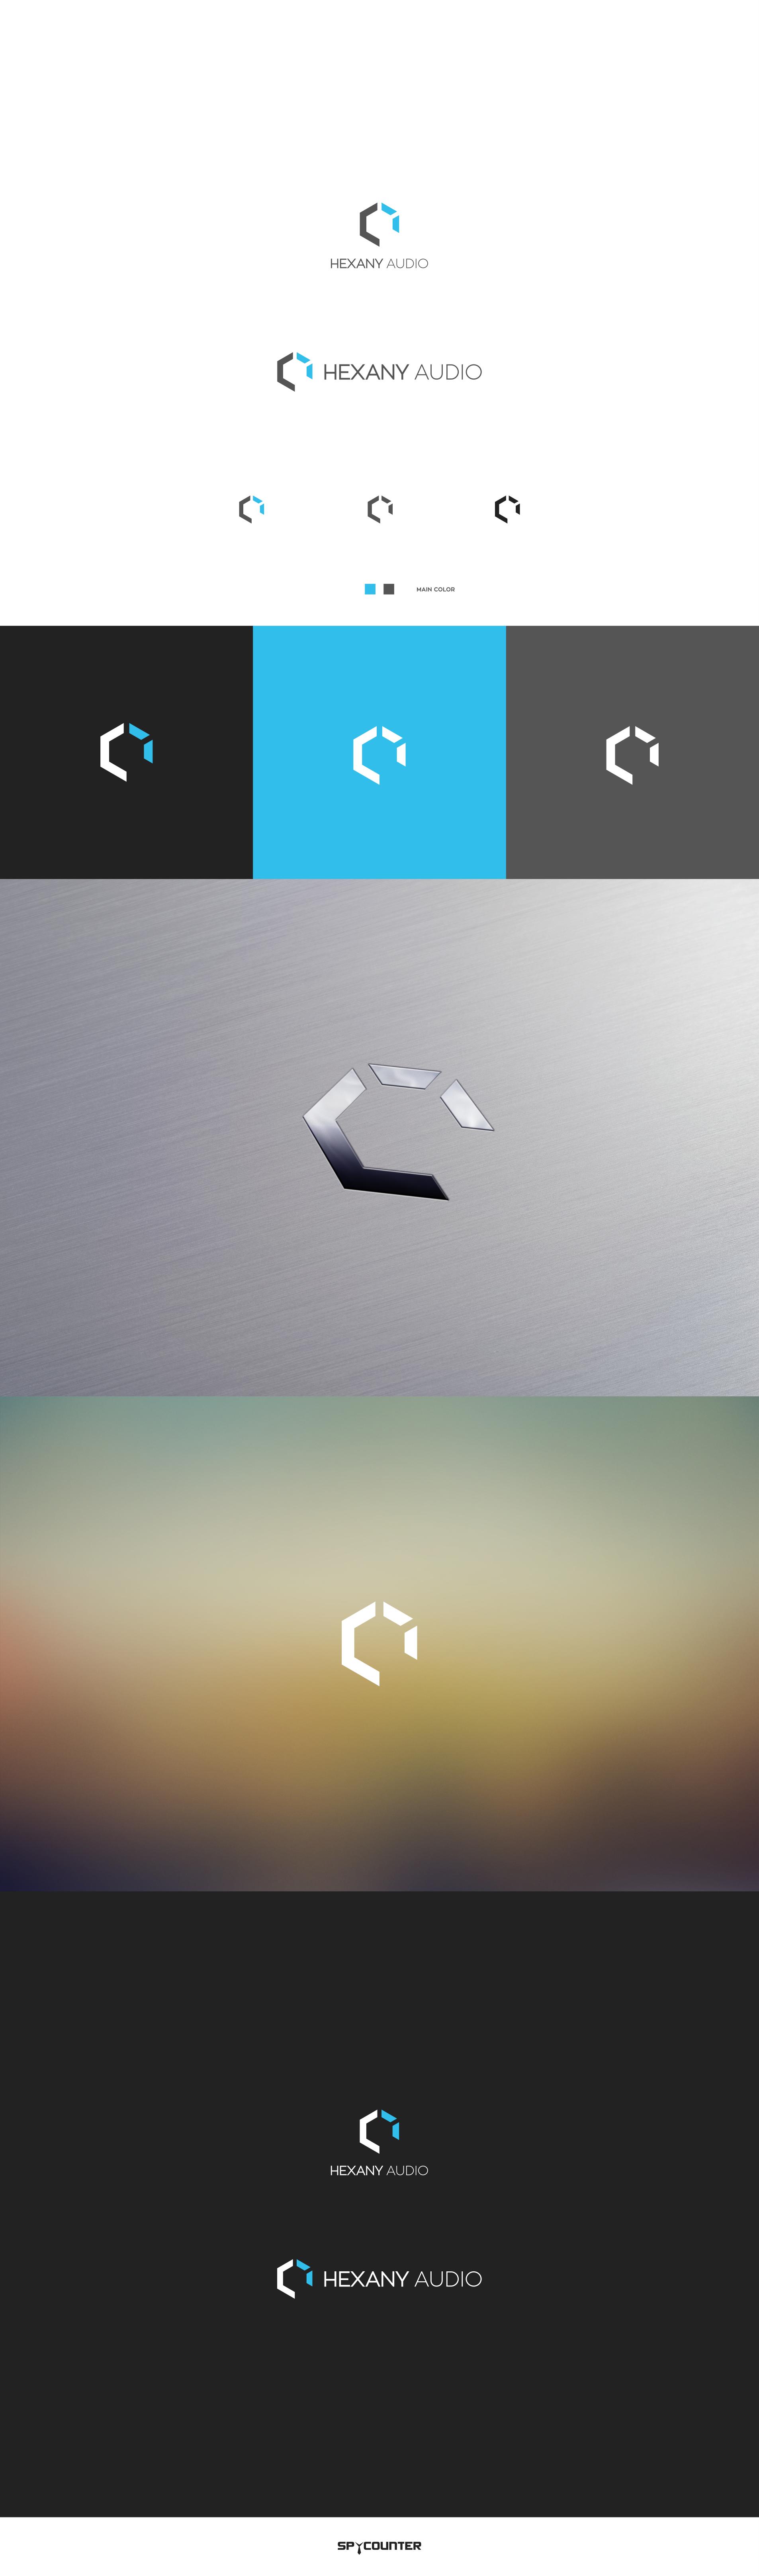 Design a modern new logo for Hexany Audio